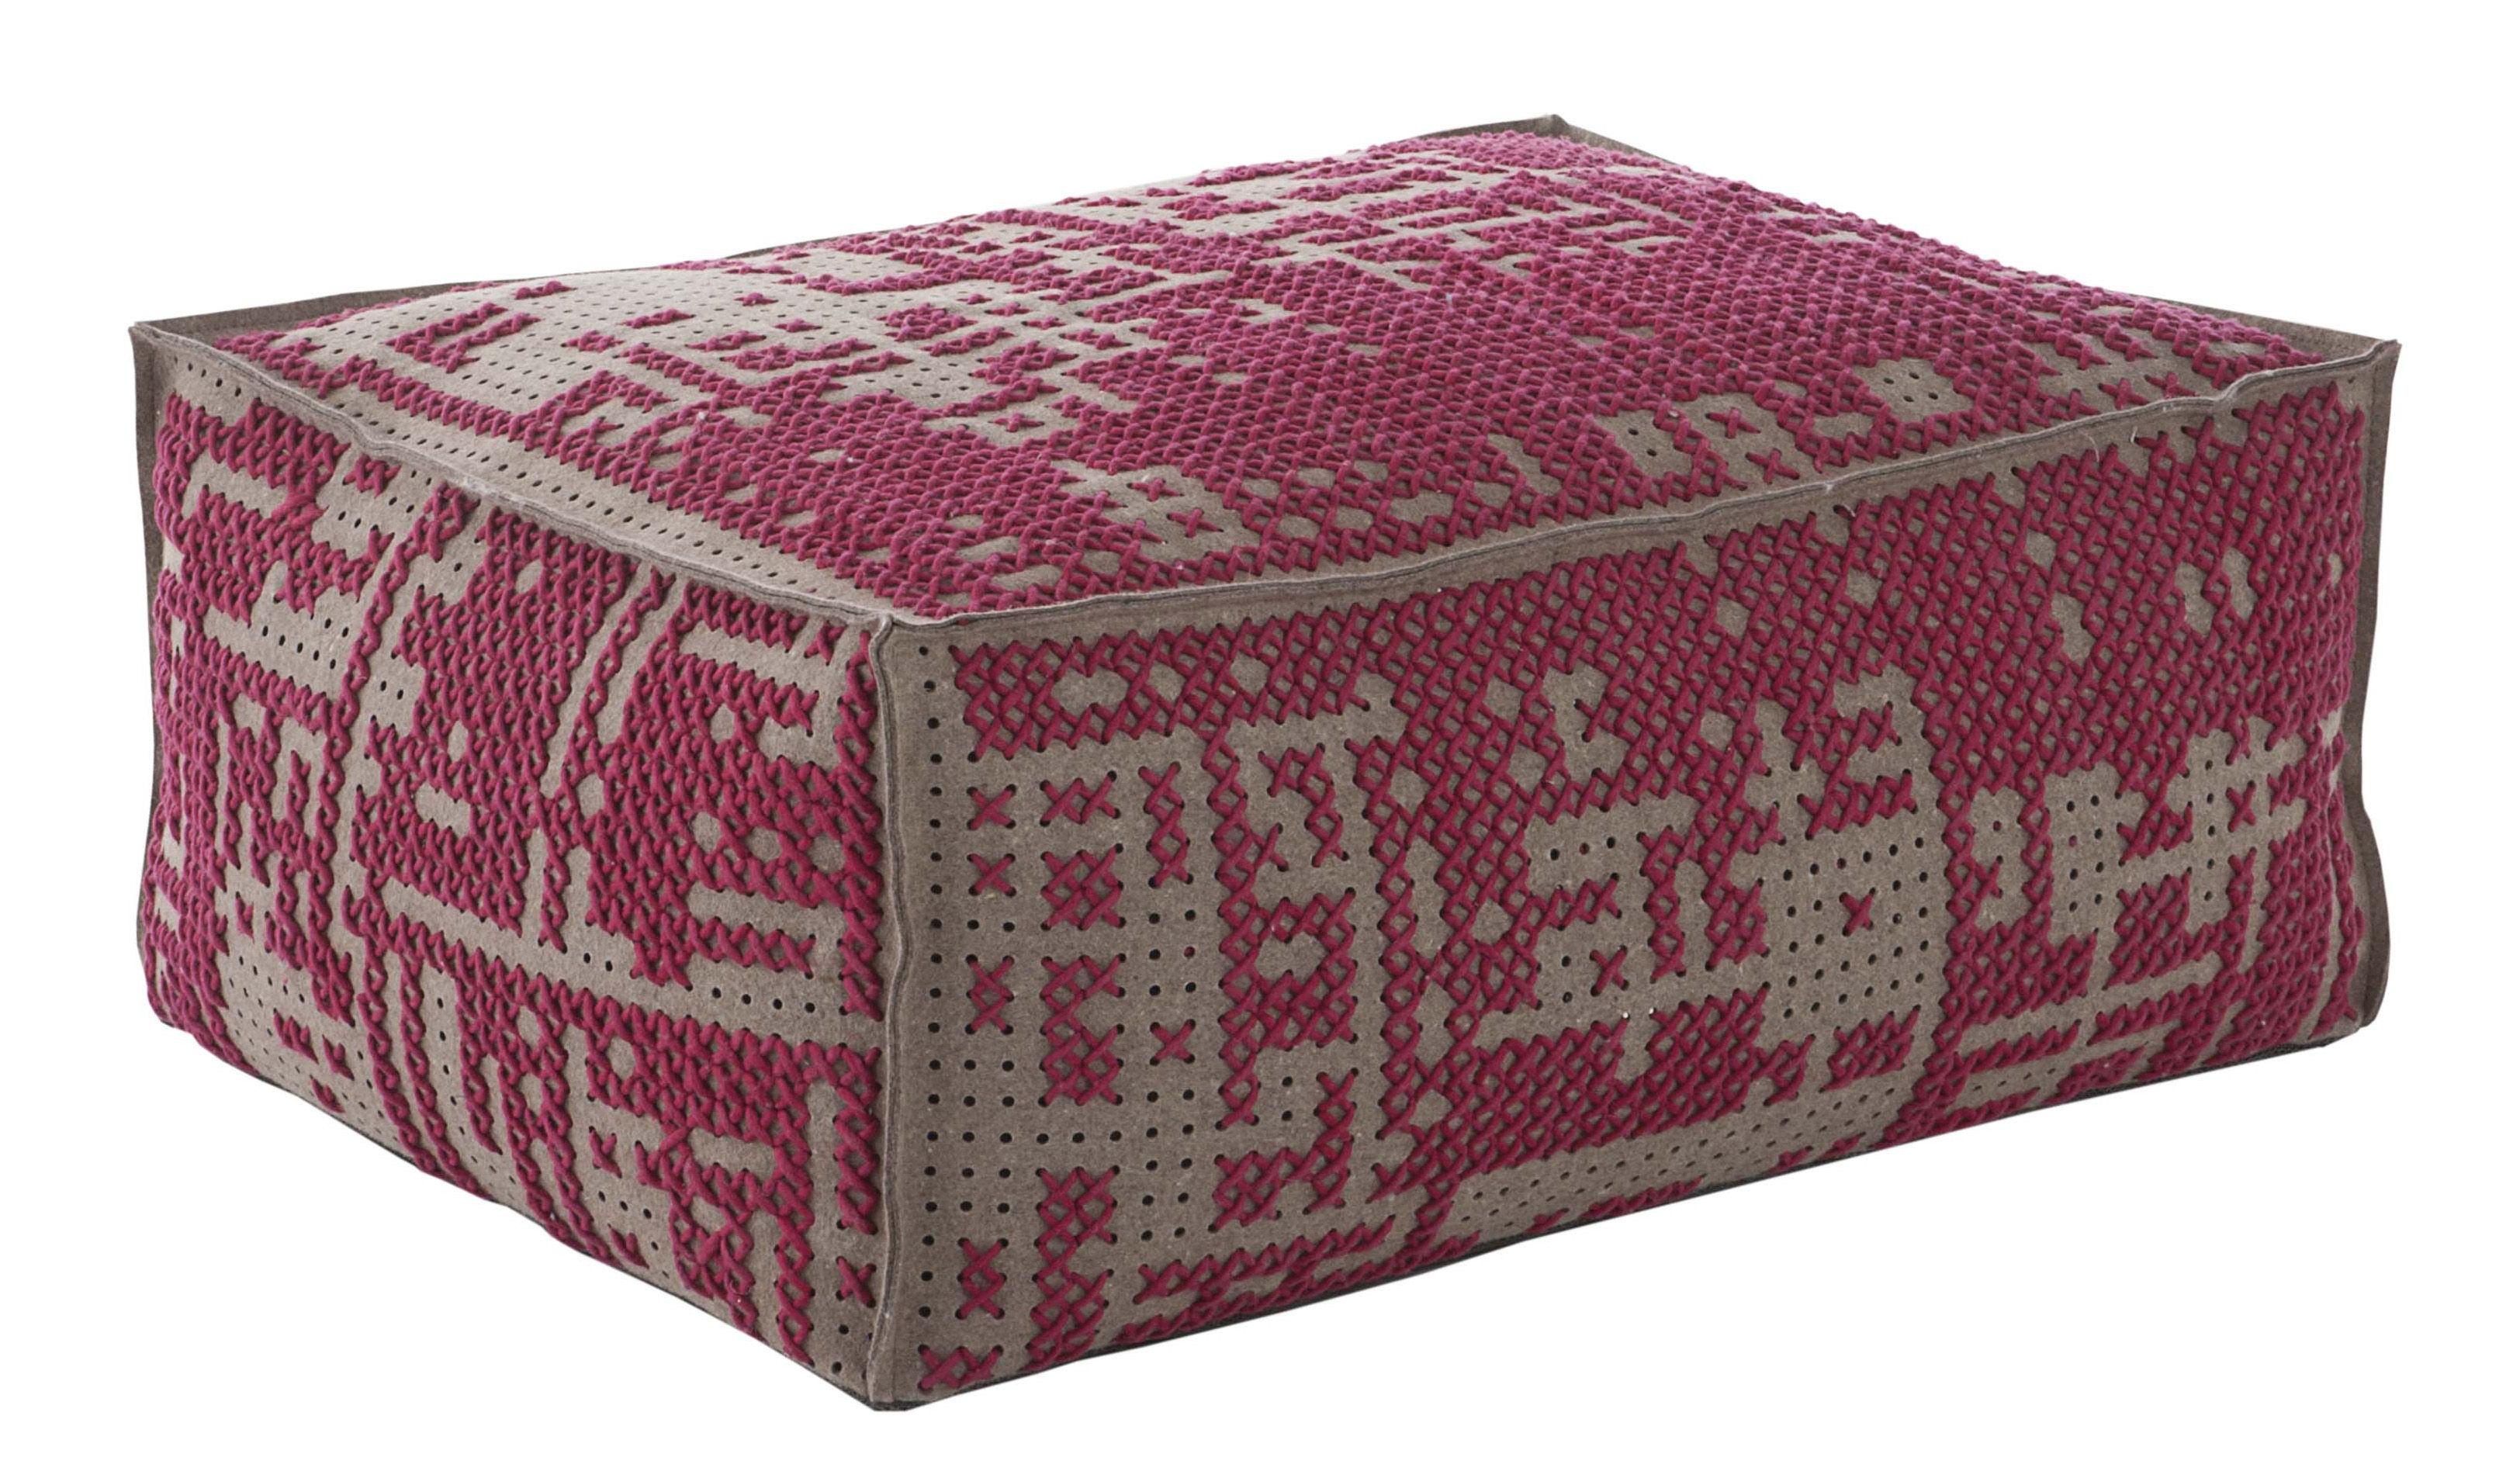 Furniture - Poufs & Floor Cushions - Abstract Pouf - 100 x 70 cm by Gan - Pink / Grey - Felt, Rubber foam, Wood, Wool